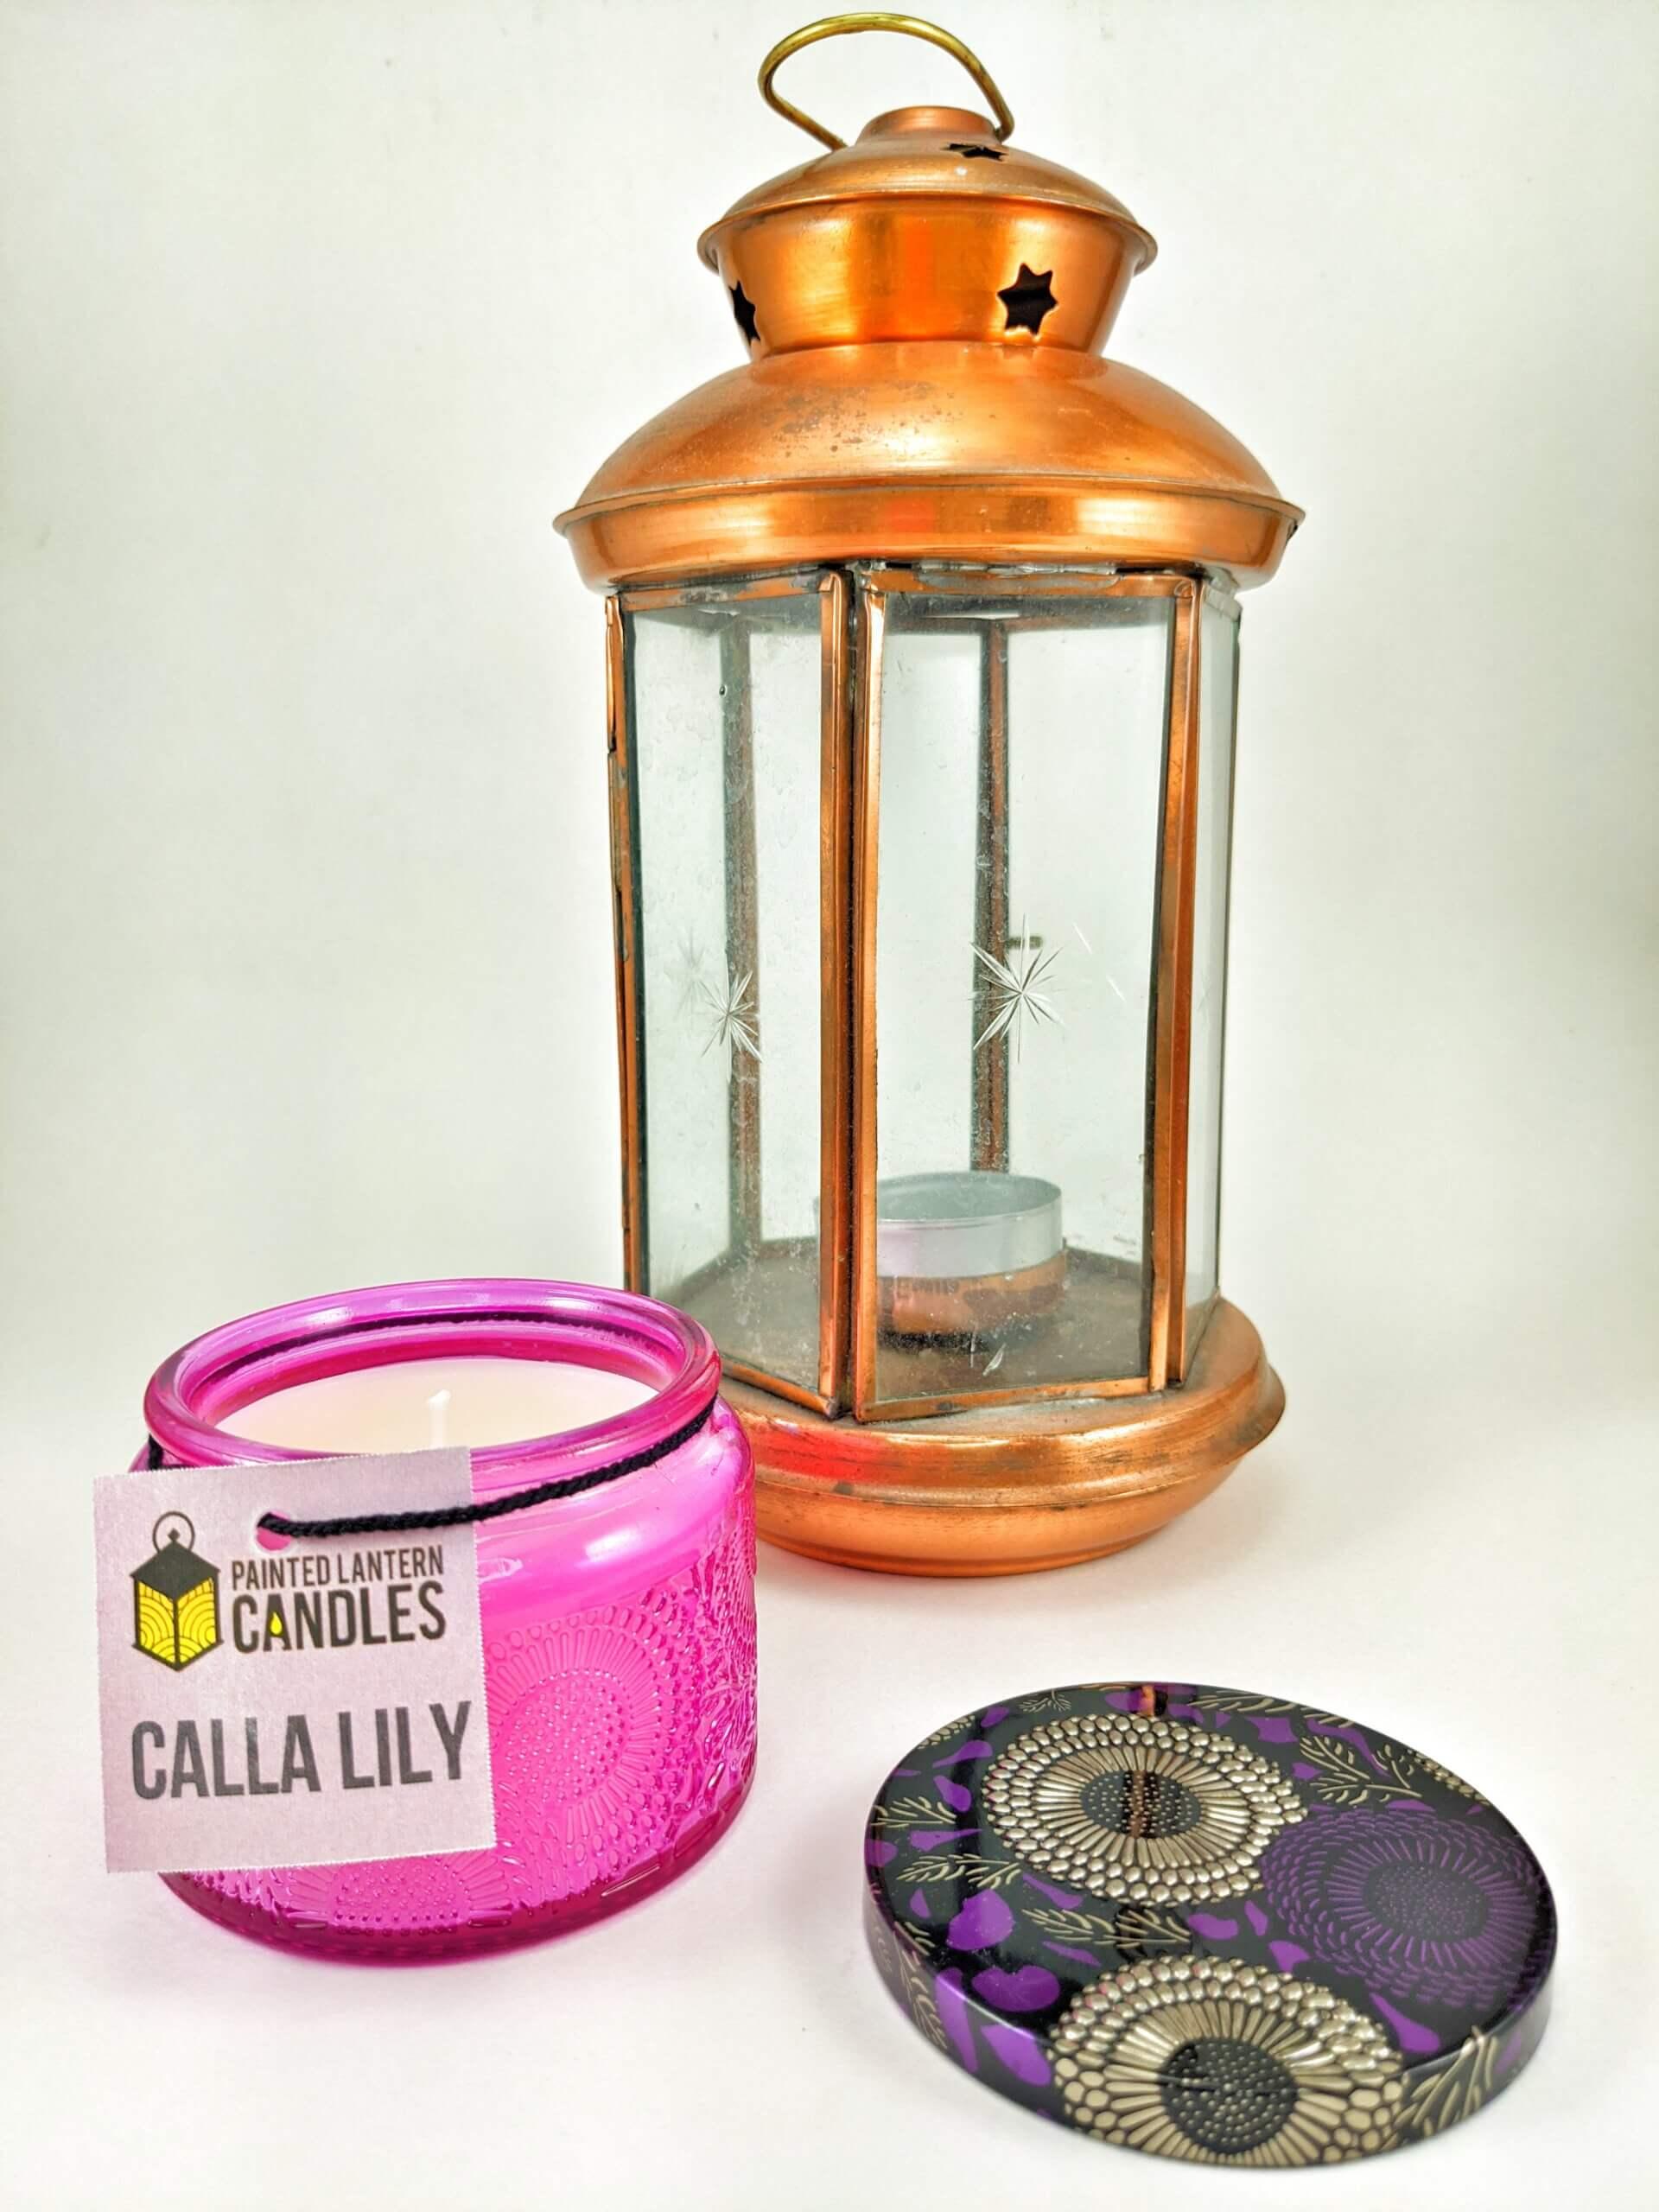 Calla Lilly Small Jar